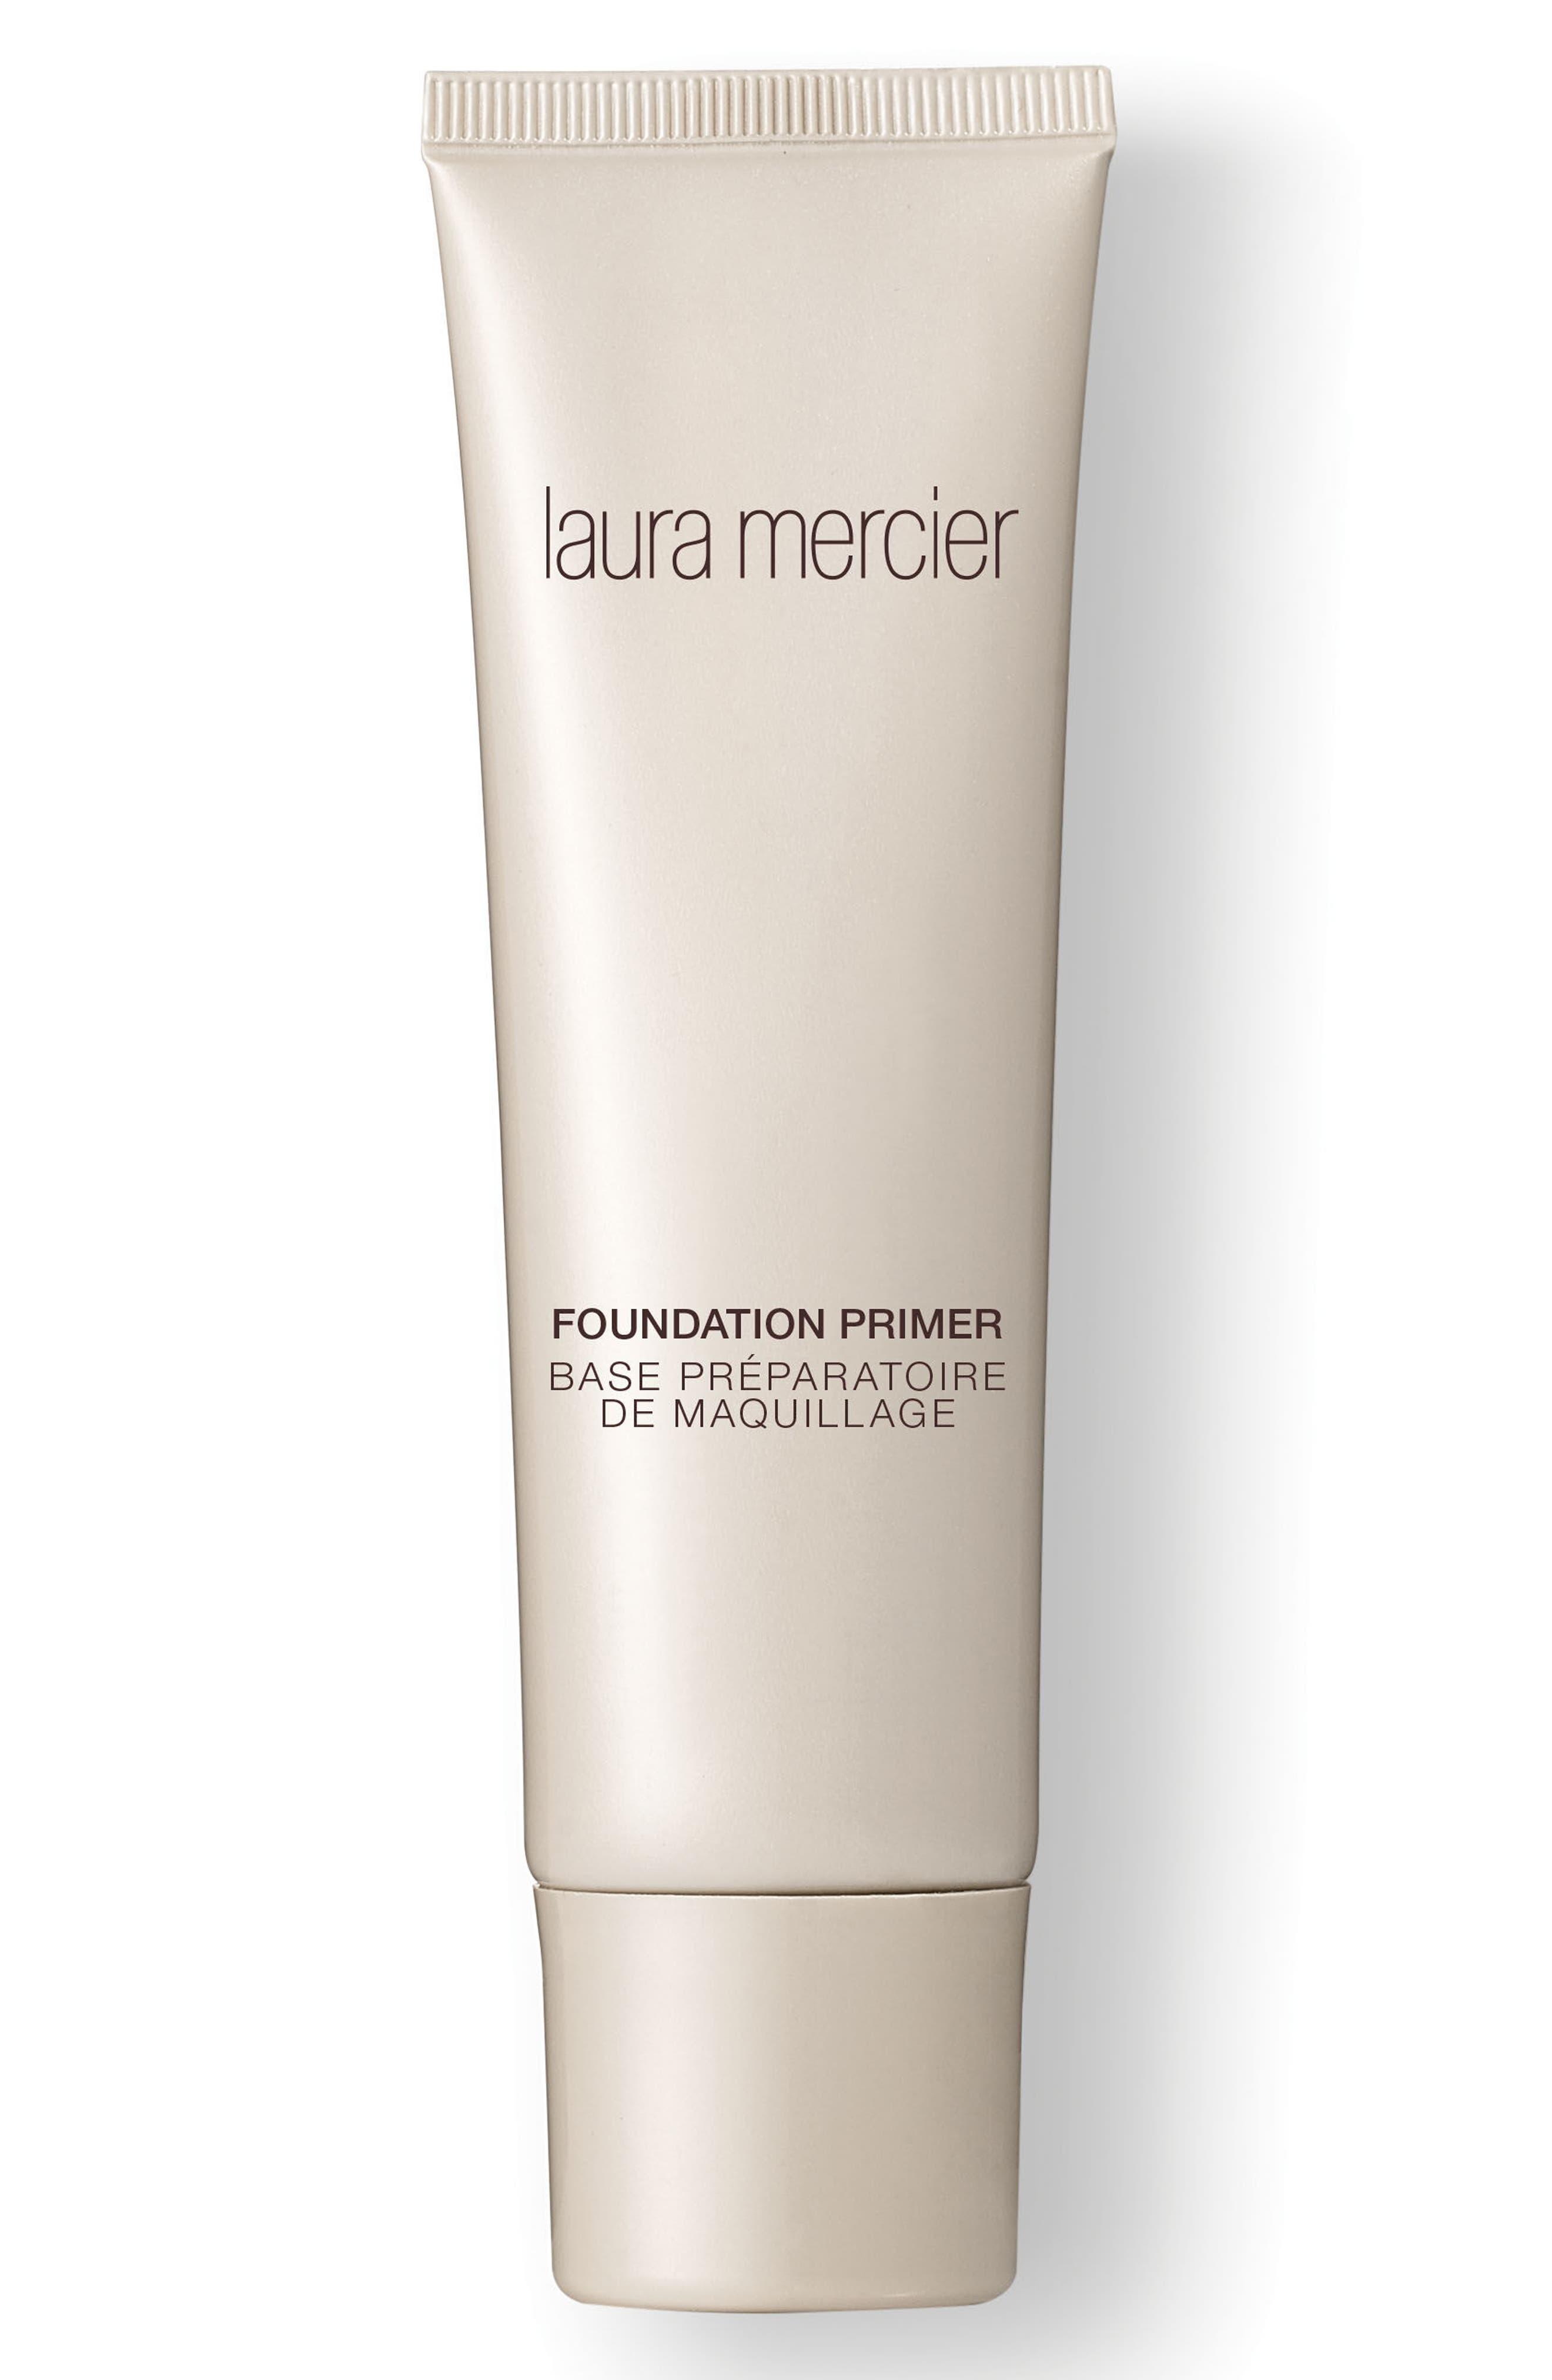 Laura Mercier Foundation Primer (1.7 oz.)